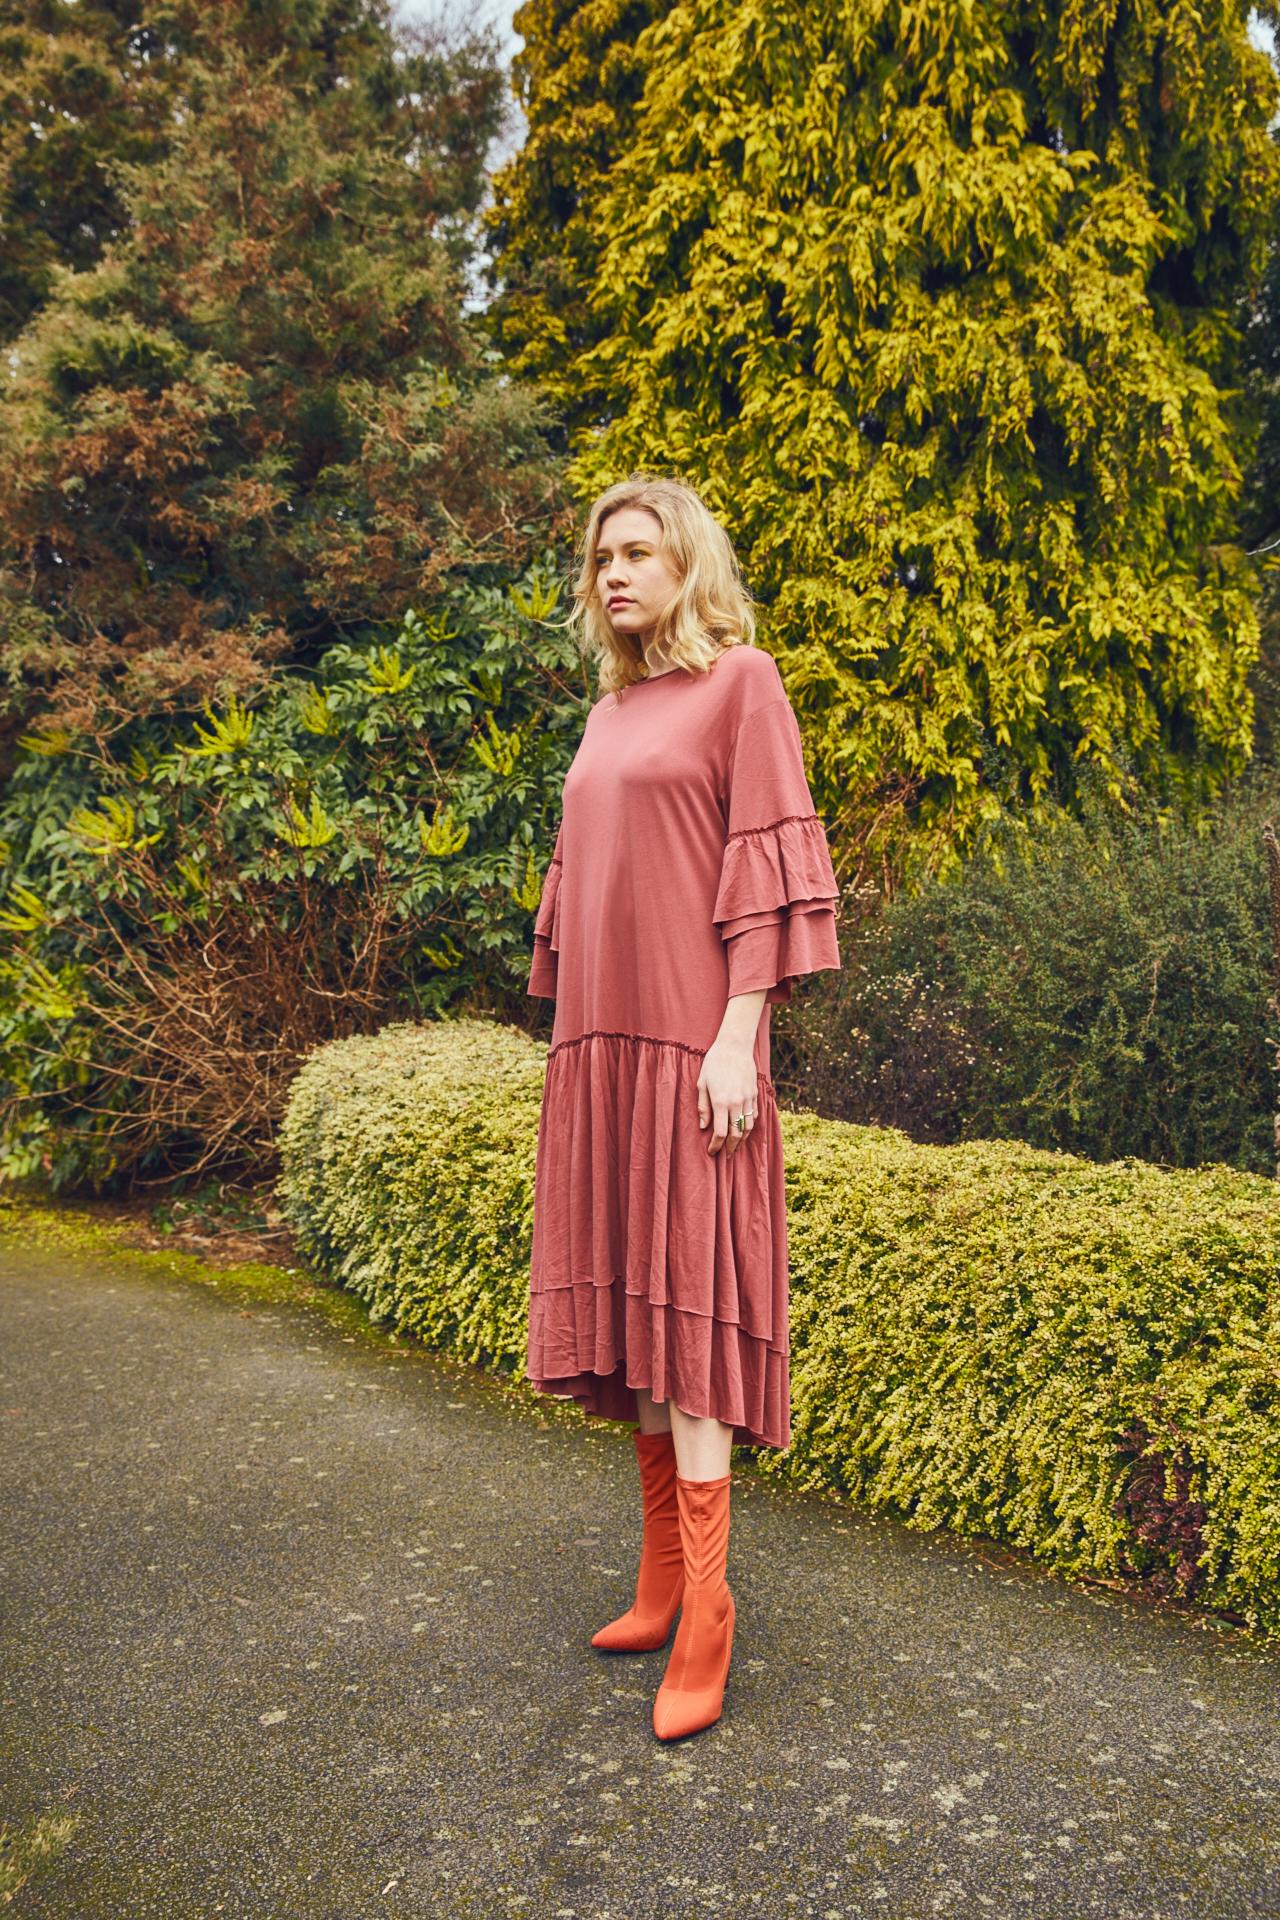 Clare in the garden